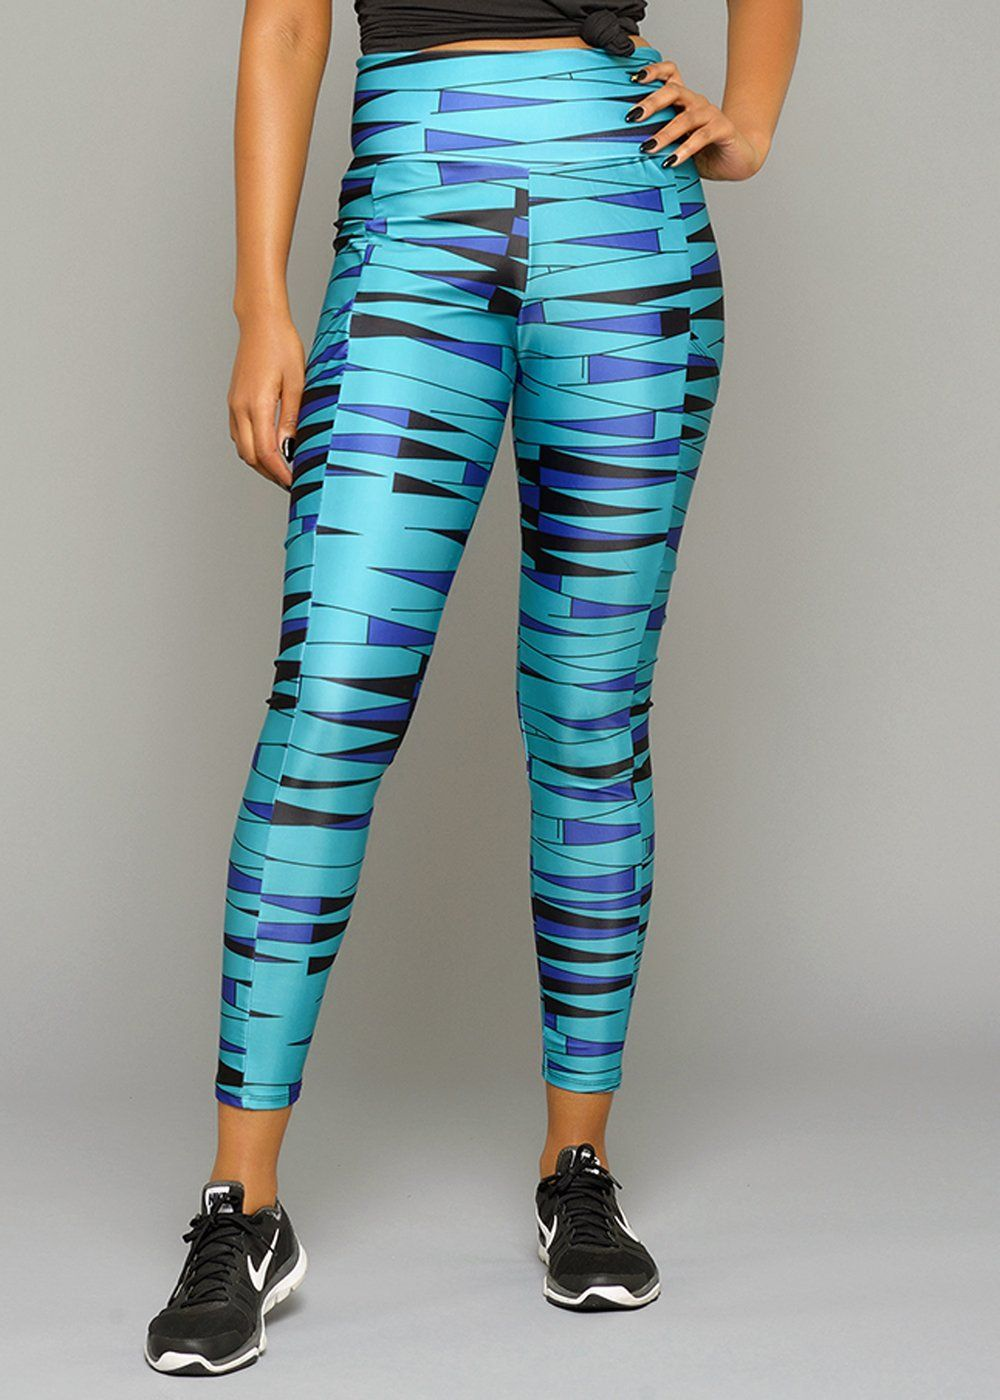 e0c2e1702a005 Naki African Print Yoga Pants Leggings (Blue Triangles)- Clearance ...